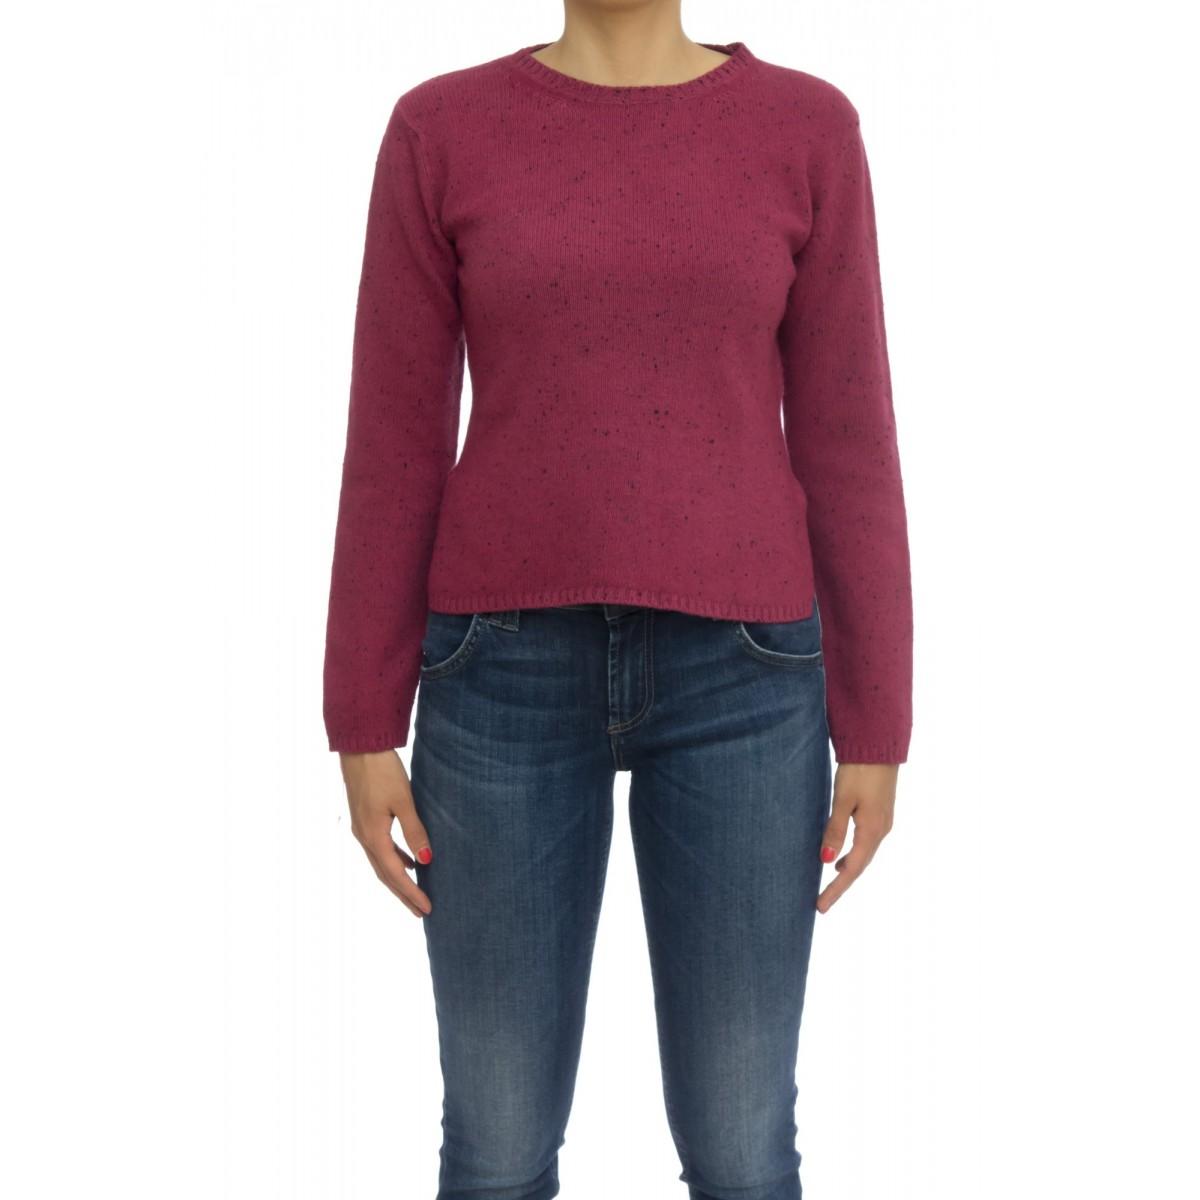 Sweater Woman- 1883501